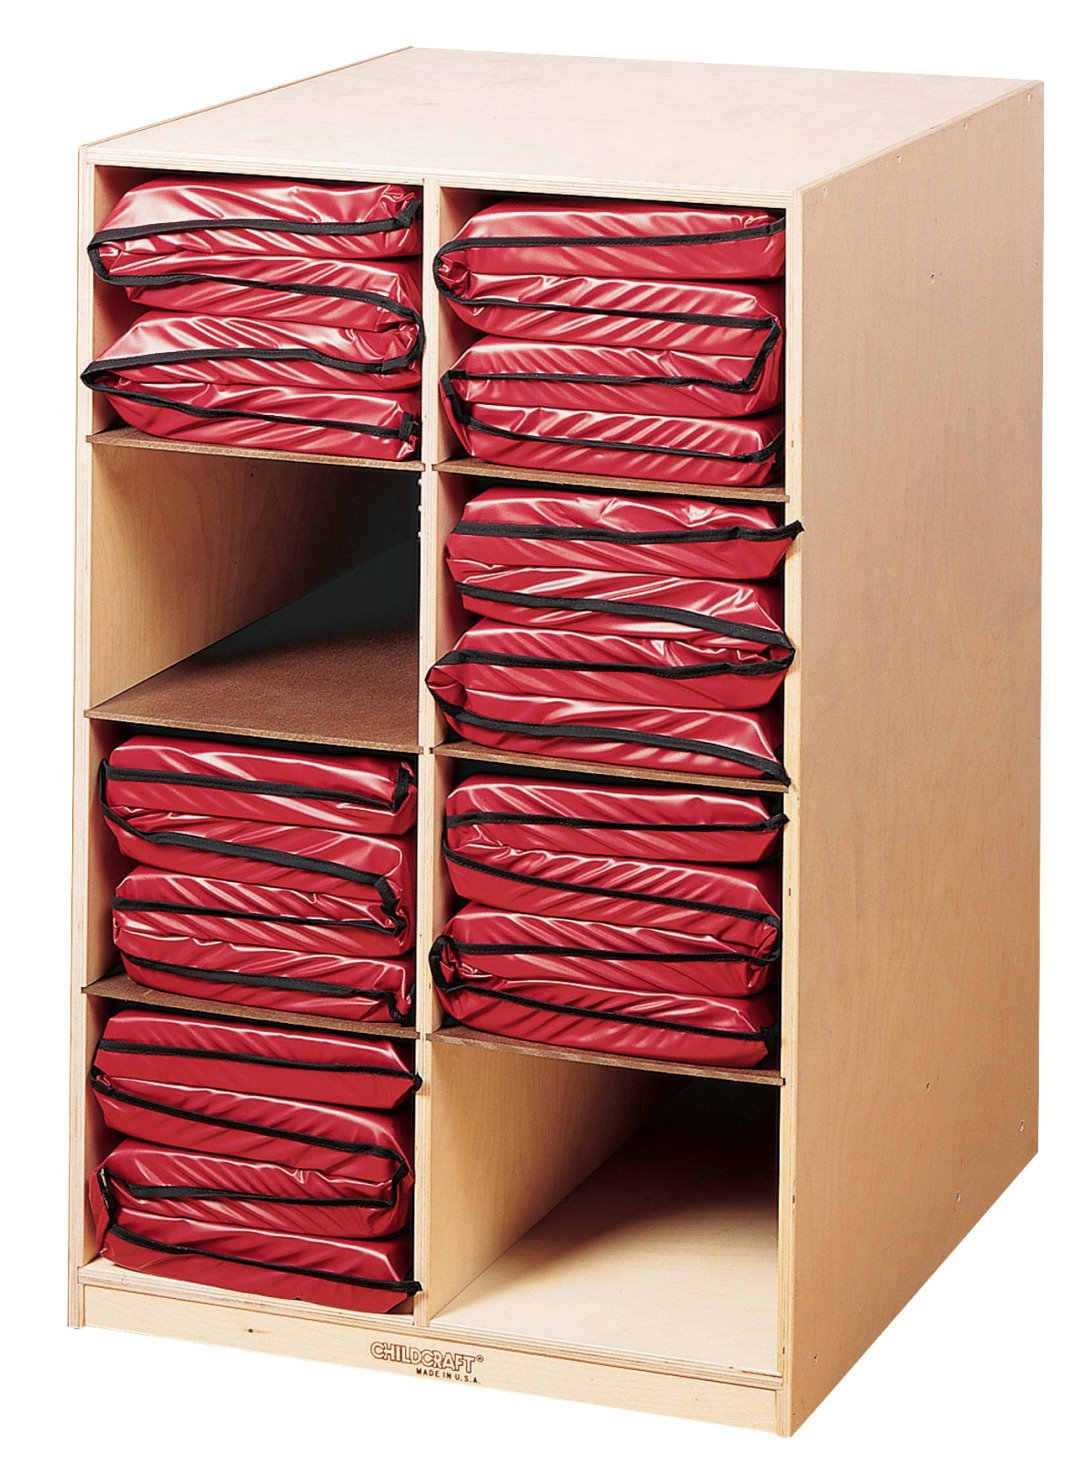 Childcraft 271831 Mobile Rest Mat Storage Center, 25-7/8'' x 24-1/8'' x 40'', Natural Wood Tone